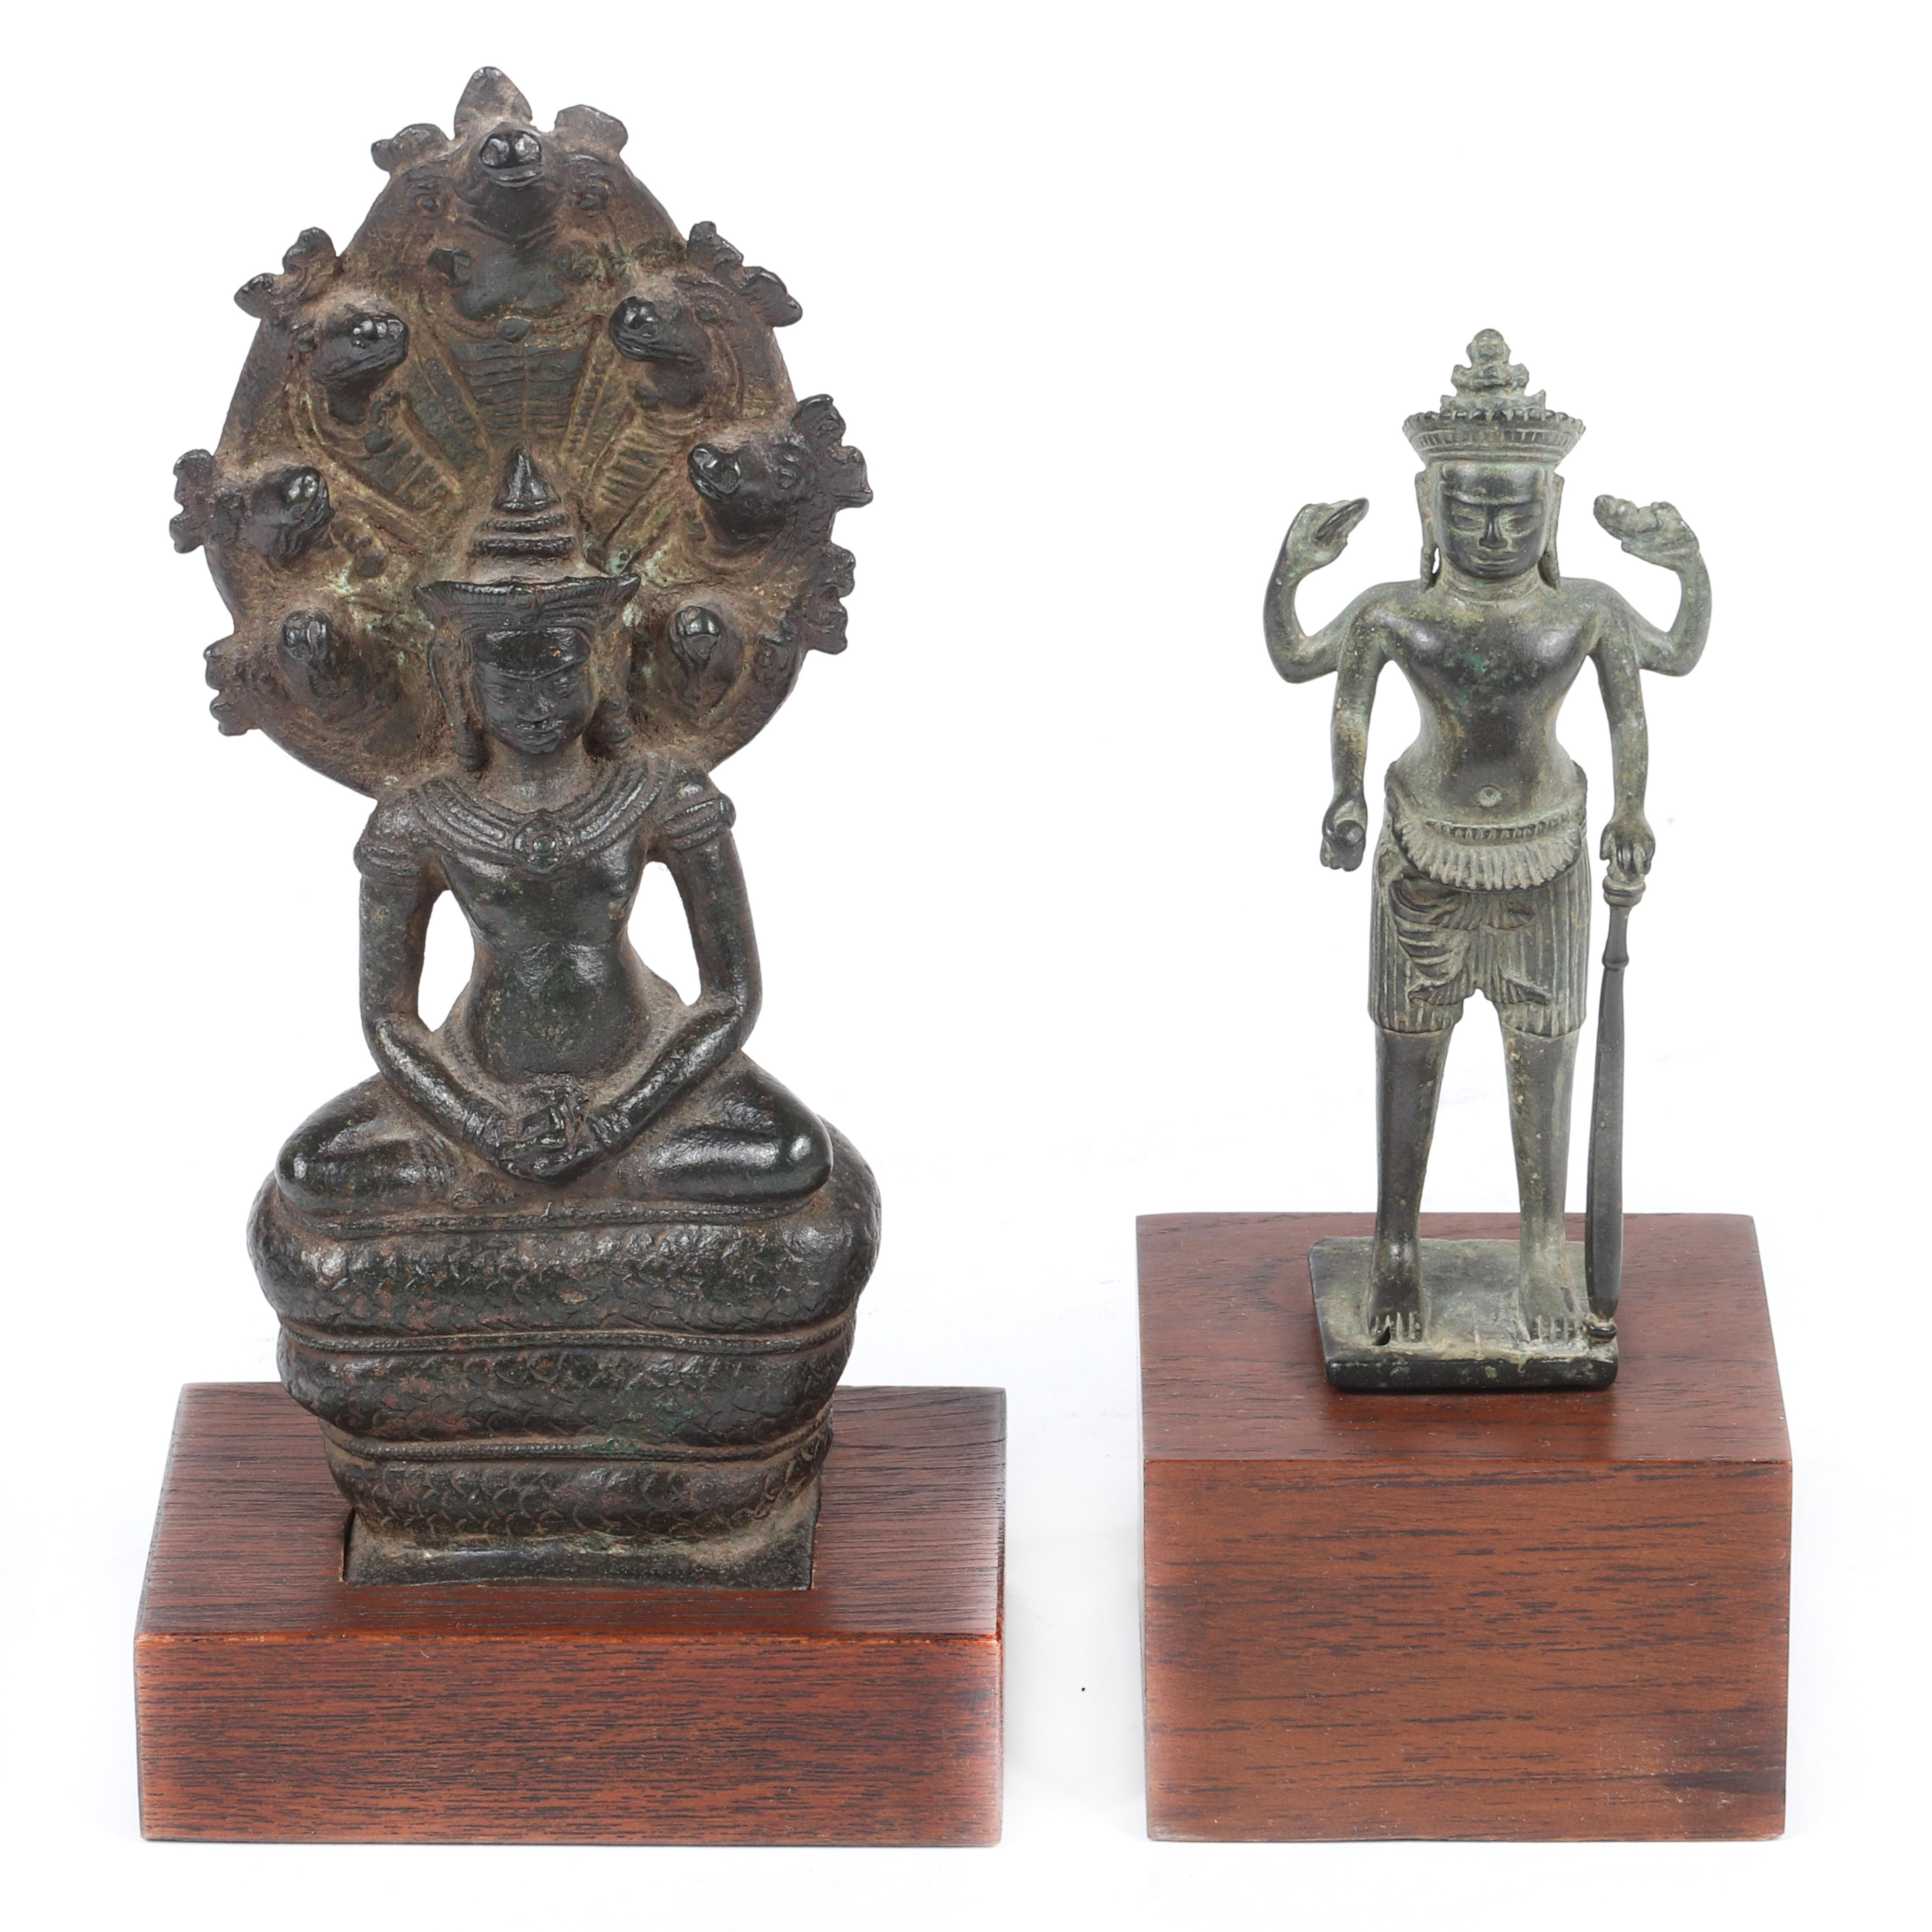 "Two Khmer style Southeast Asian copper alloy / bronze Hindu deity figures. 8 1/2""H x 3 1/2""W"